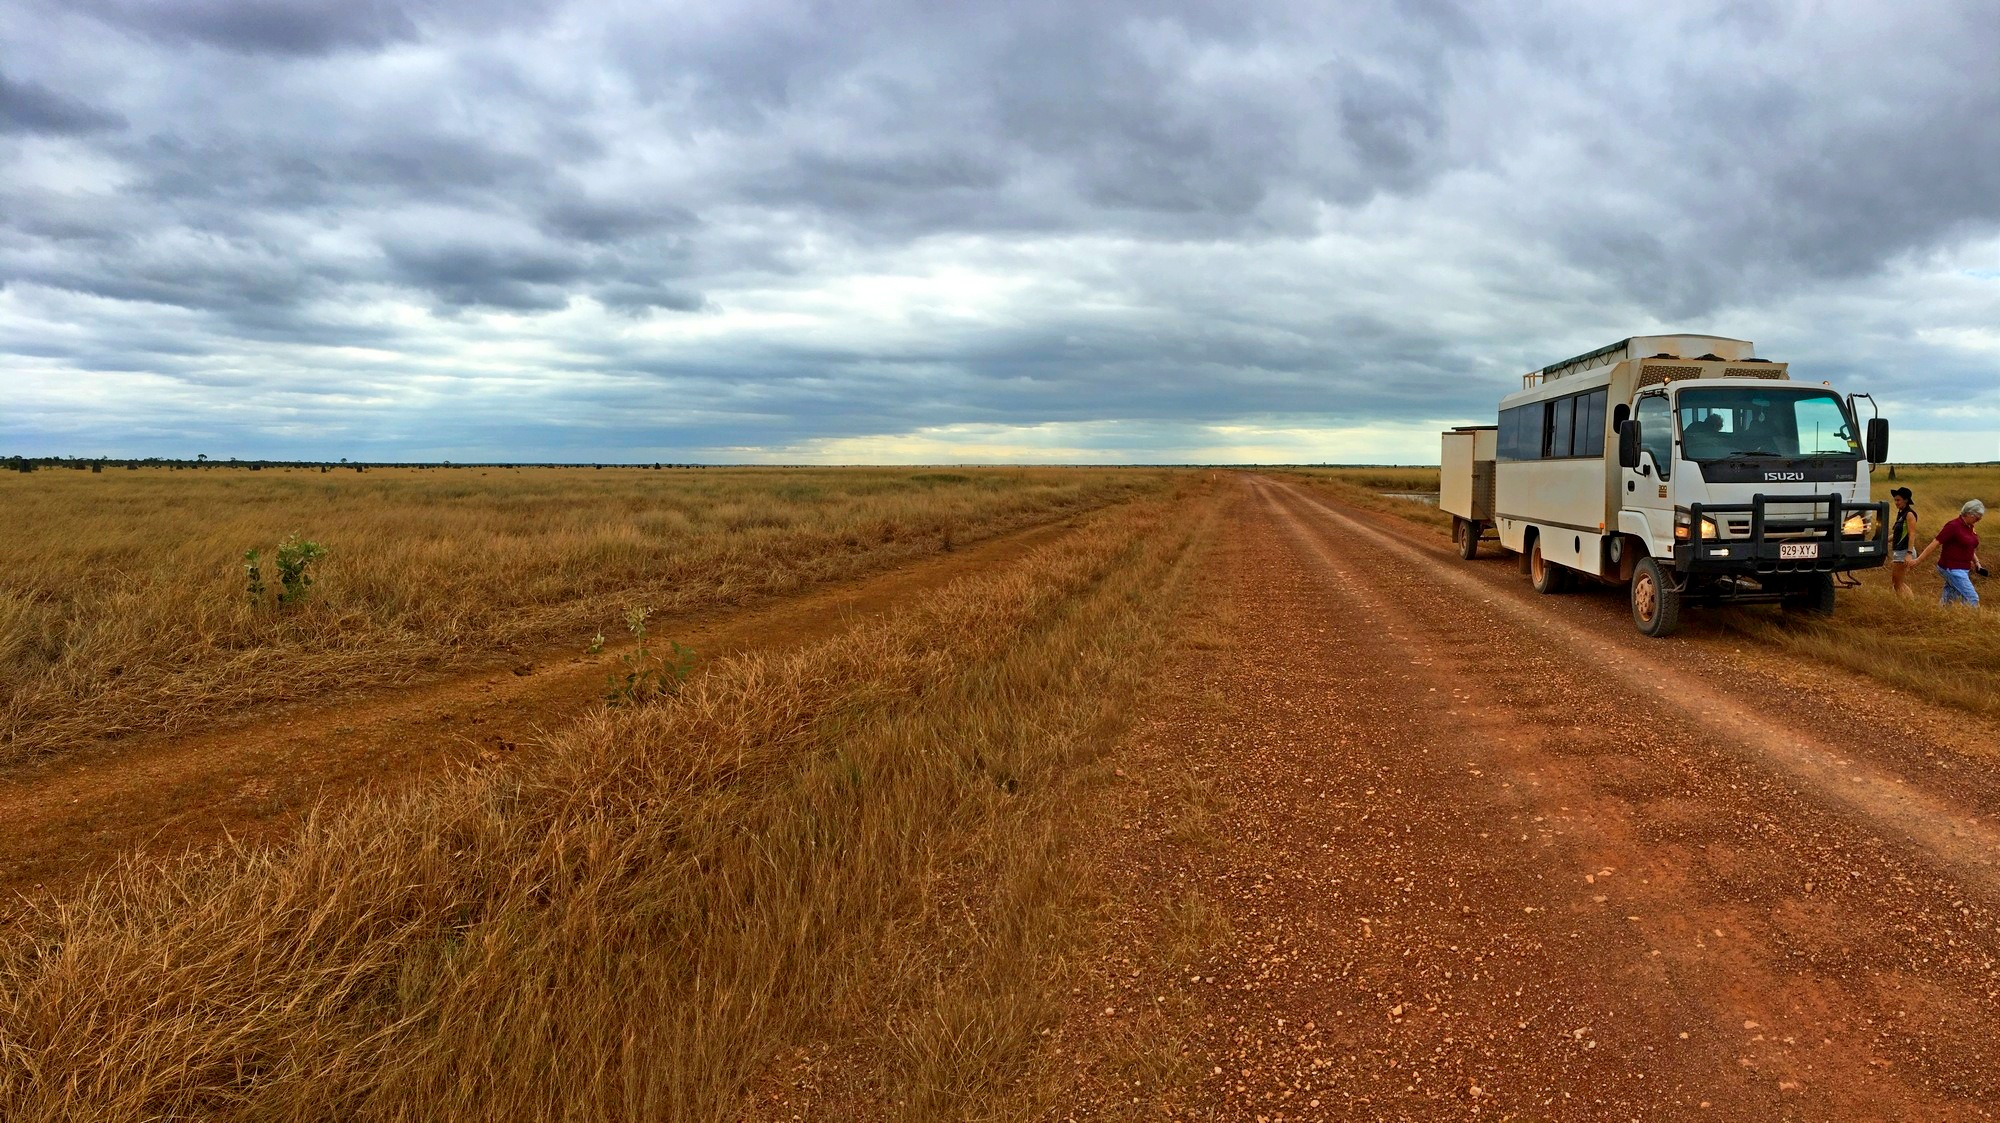 tour bus on dirt road in open plains.